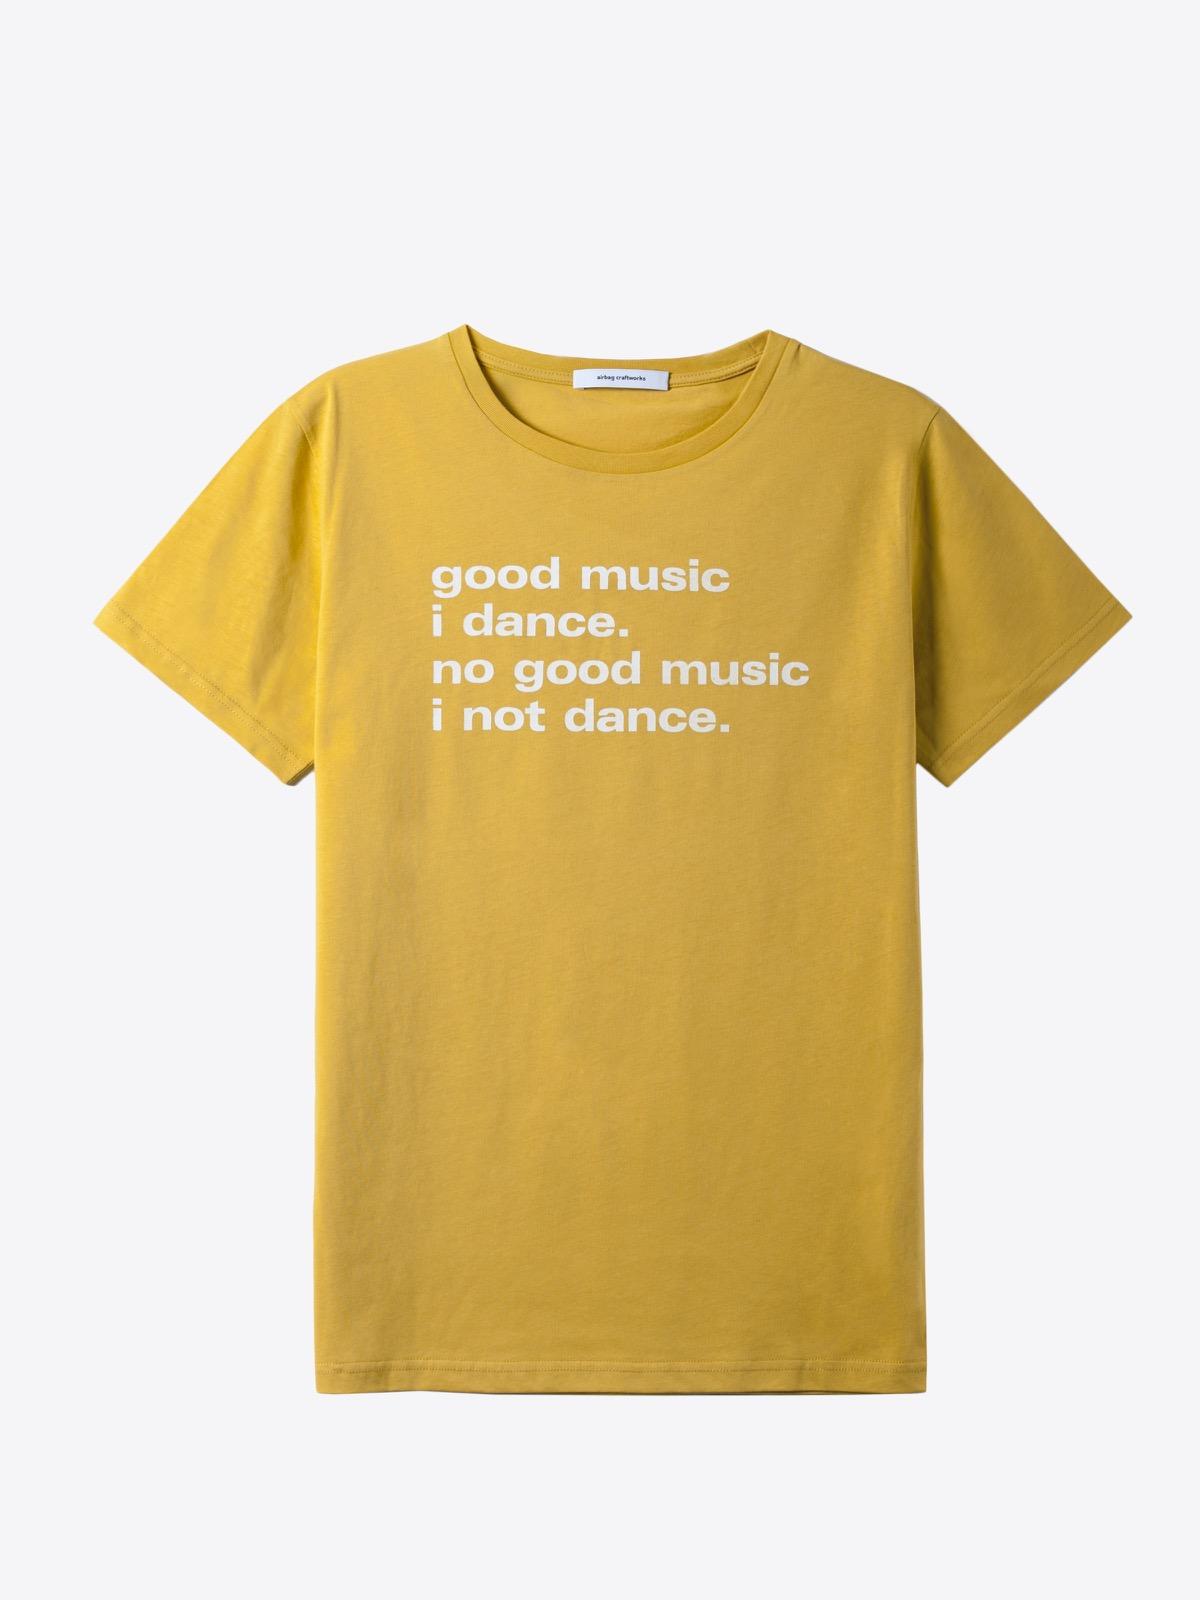 airbag craftworks good music i dance   gold